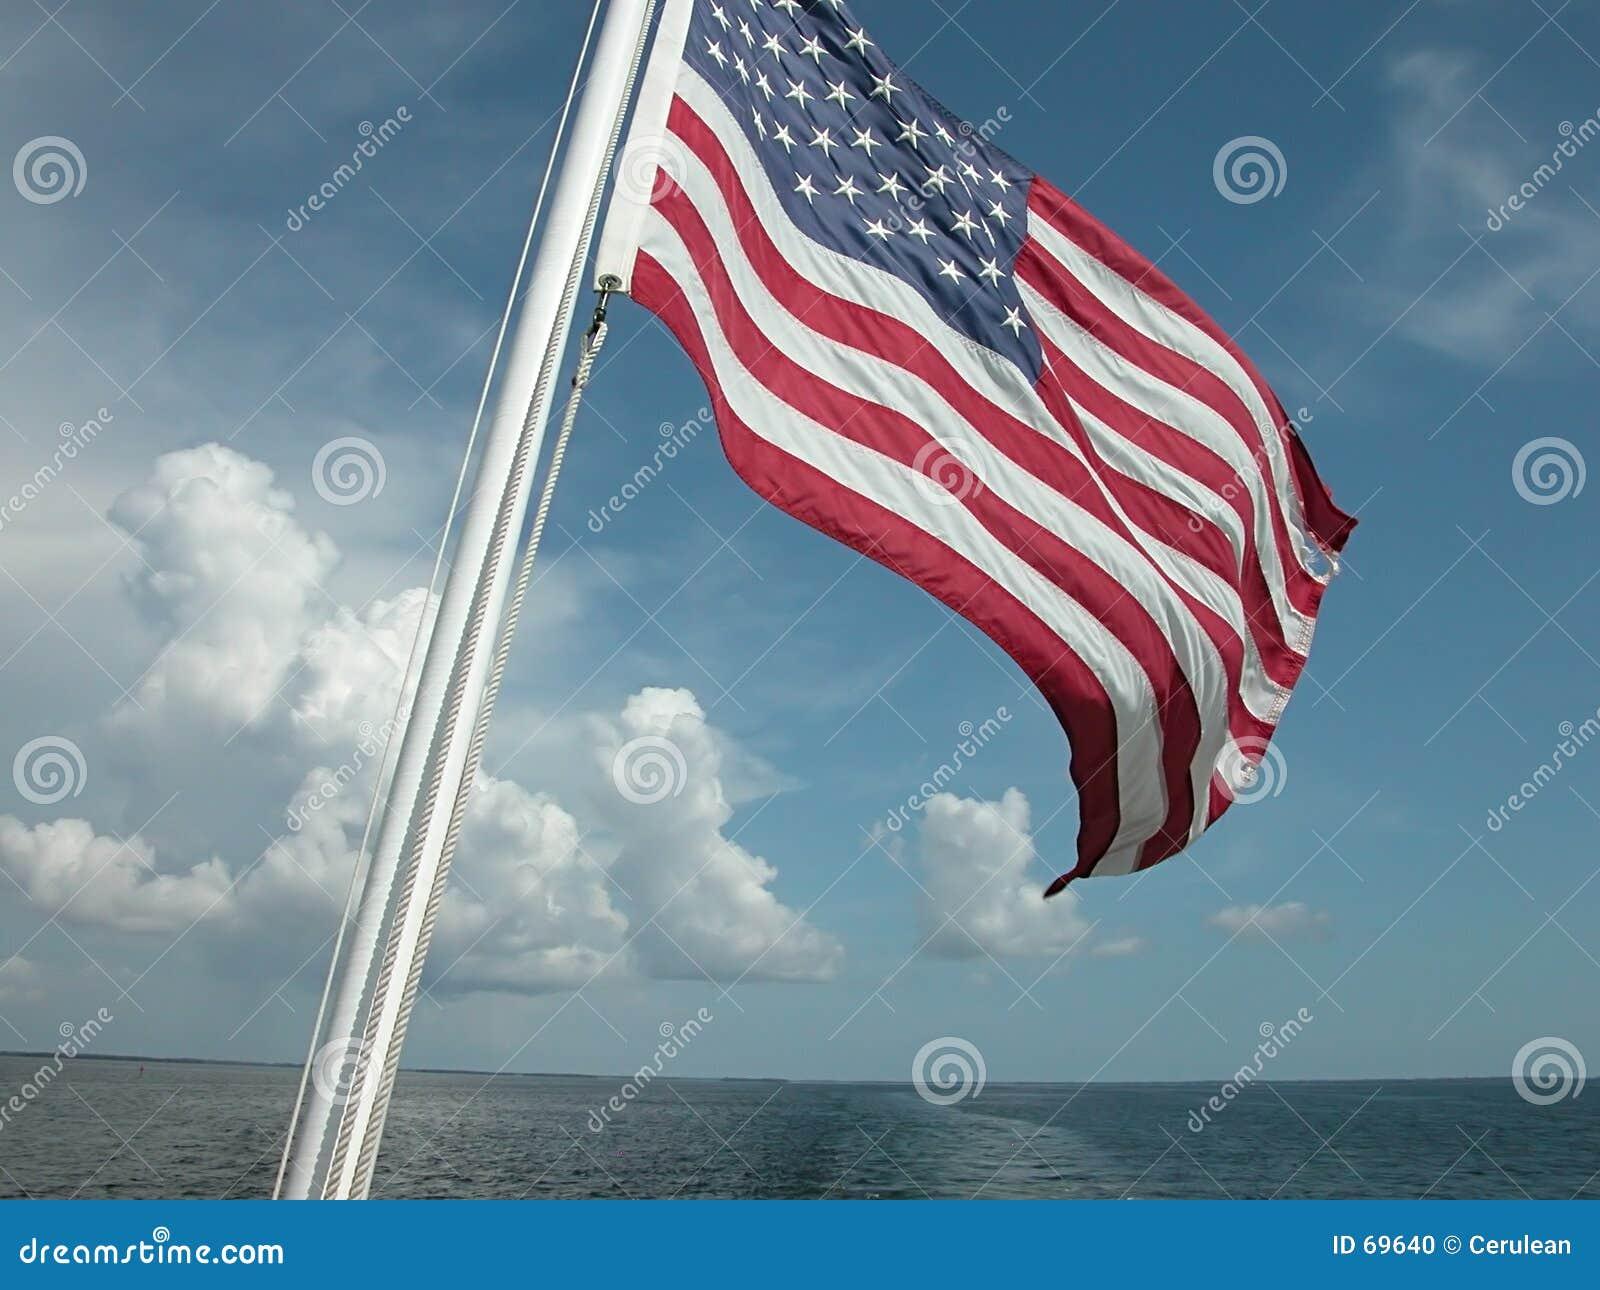 Flag and Ocean